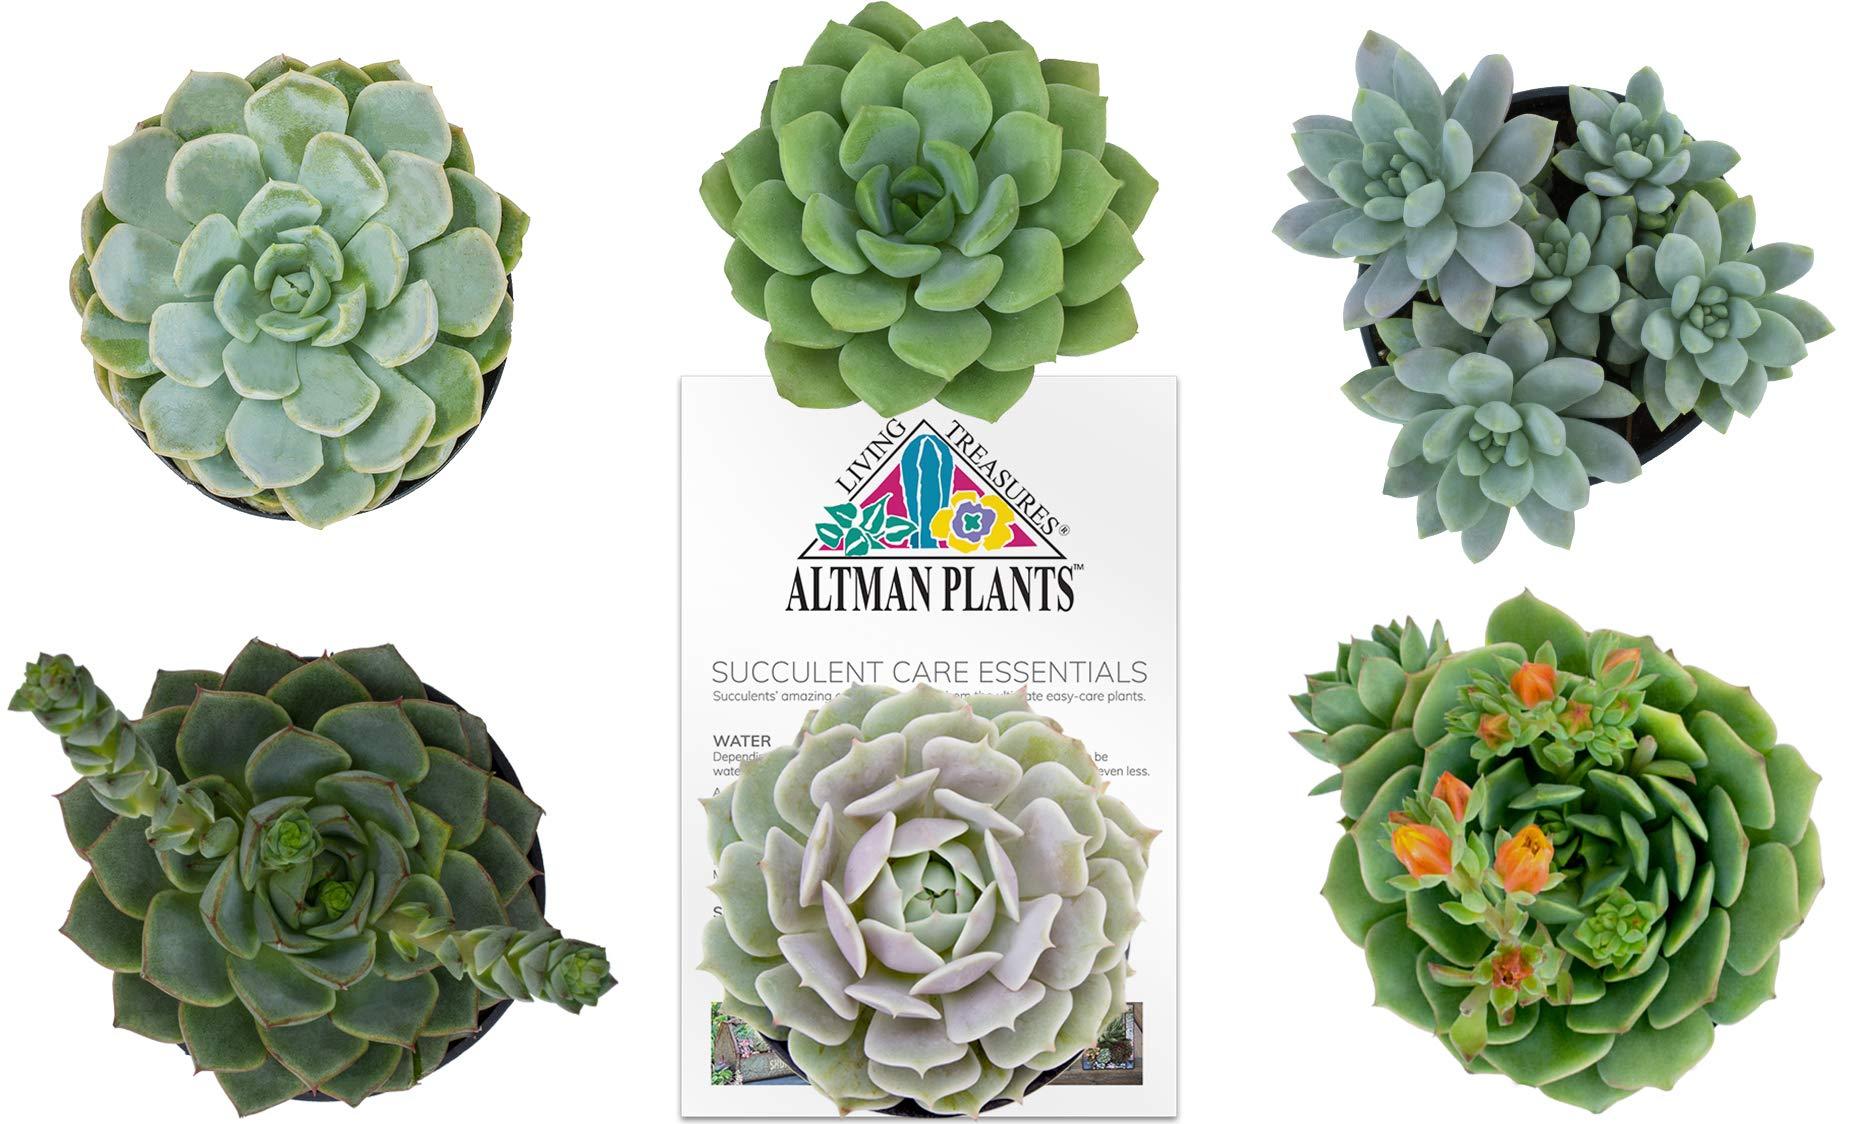 Altman Plants Assorted Live Succulents Flowering Rosette Collection Echeveria, sedeveria, perfect for party favors and arrangements, 3.5'', 6 Pack